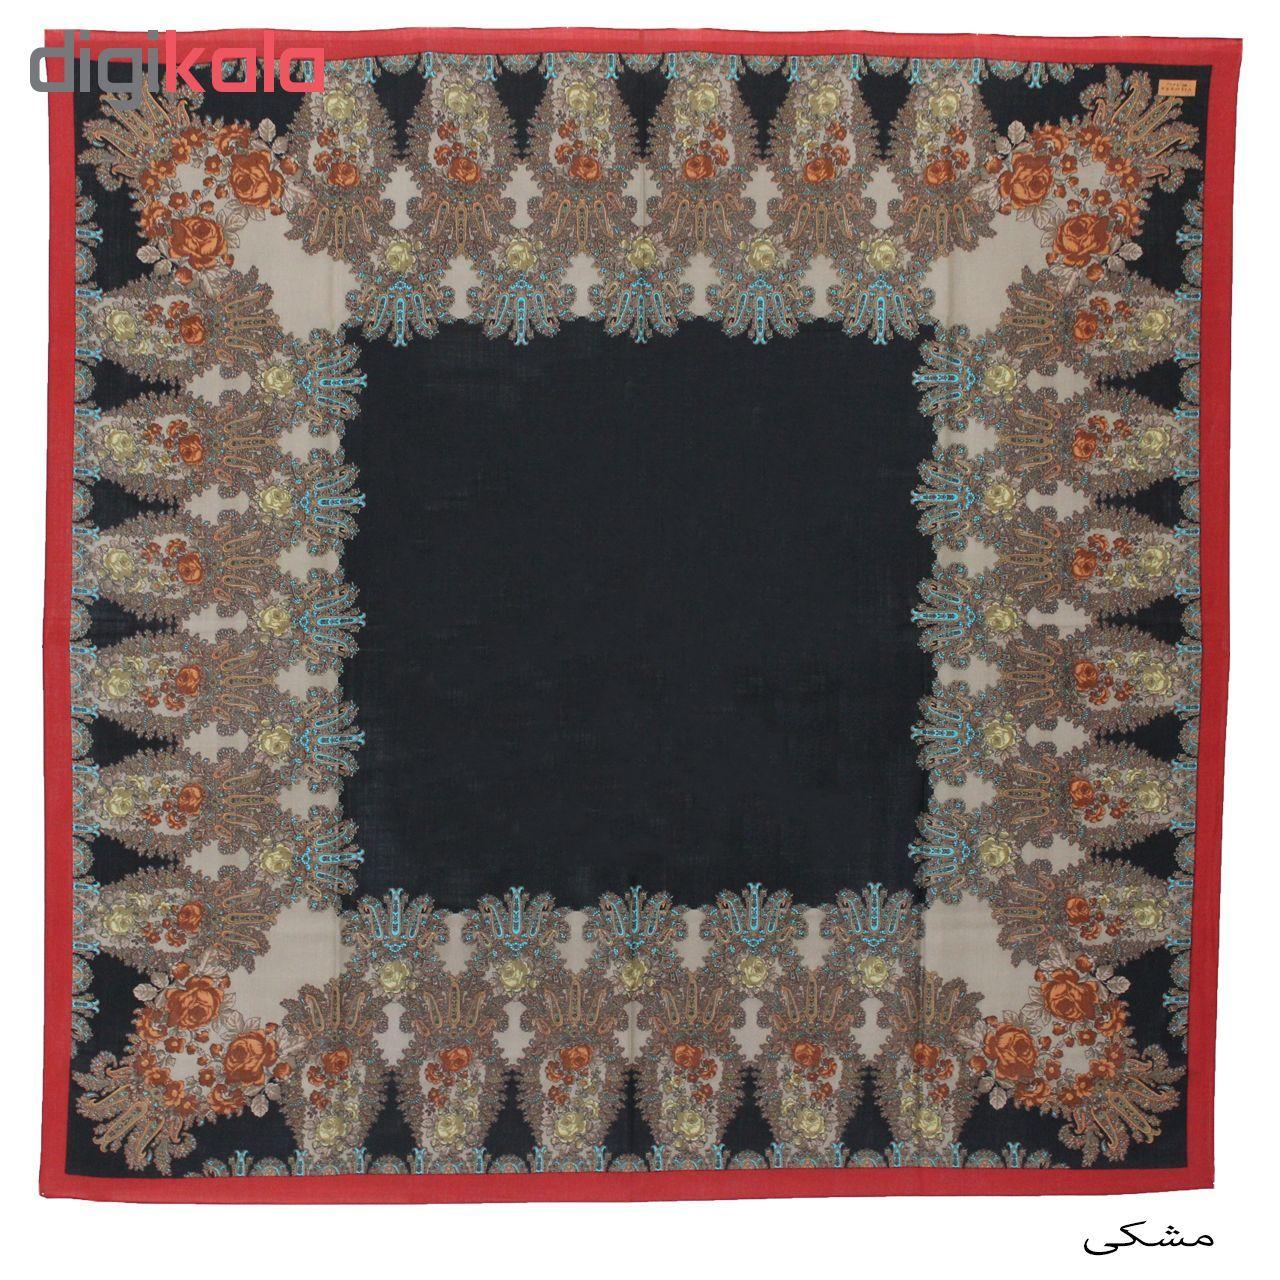 روسری زنانه برند ویسمارا مدل ملکه کد ۰۰۱۰ main 1 1